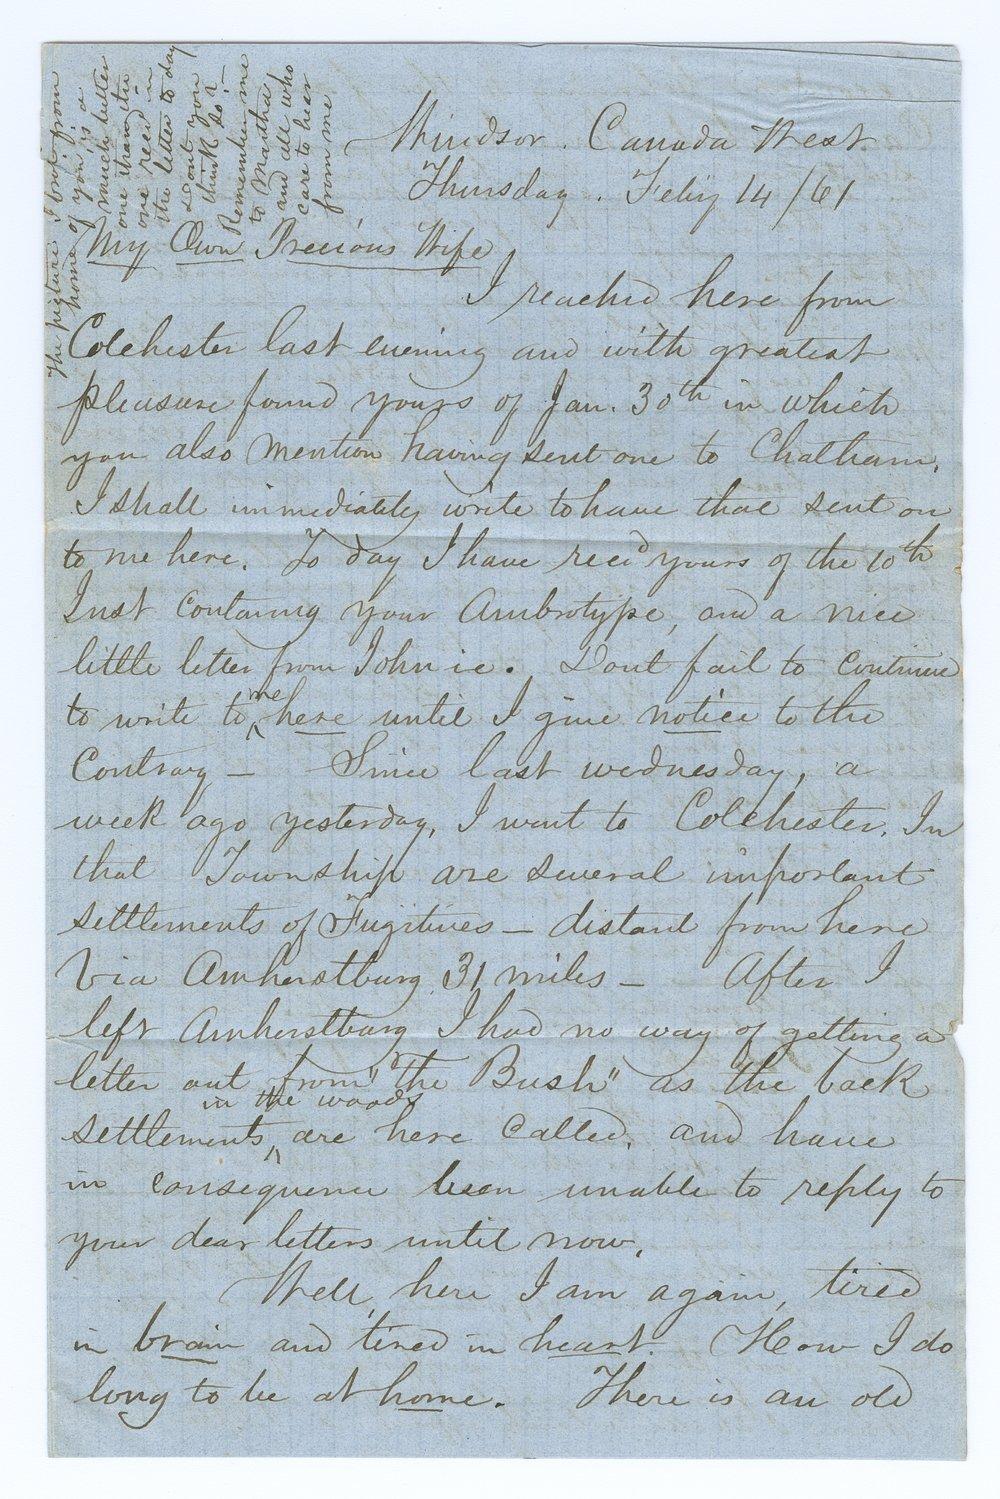 John Brown, Jr. correspondence - 1